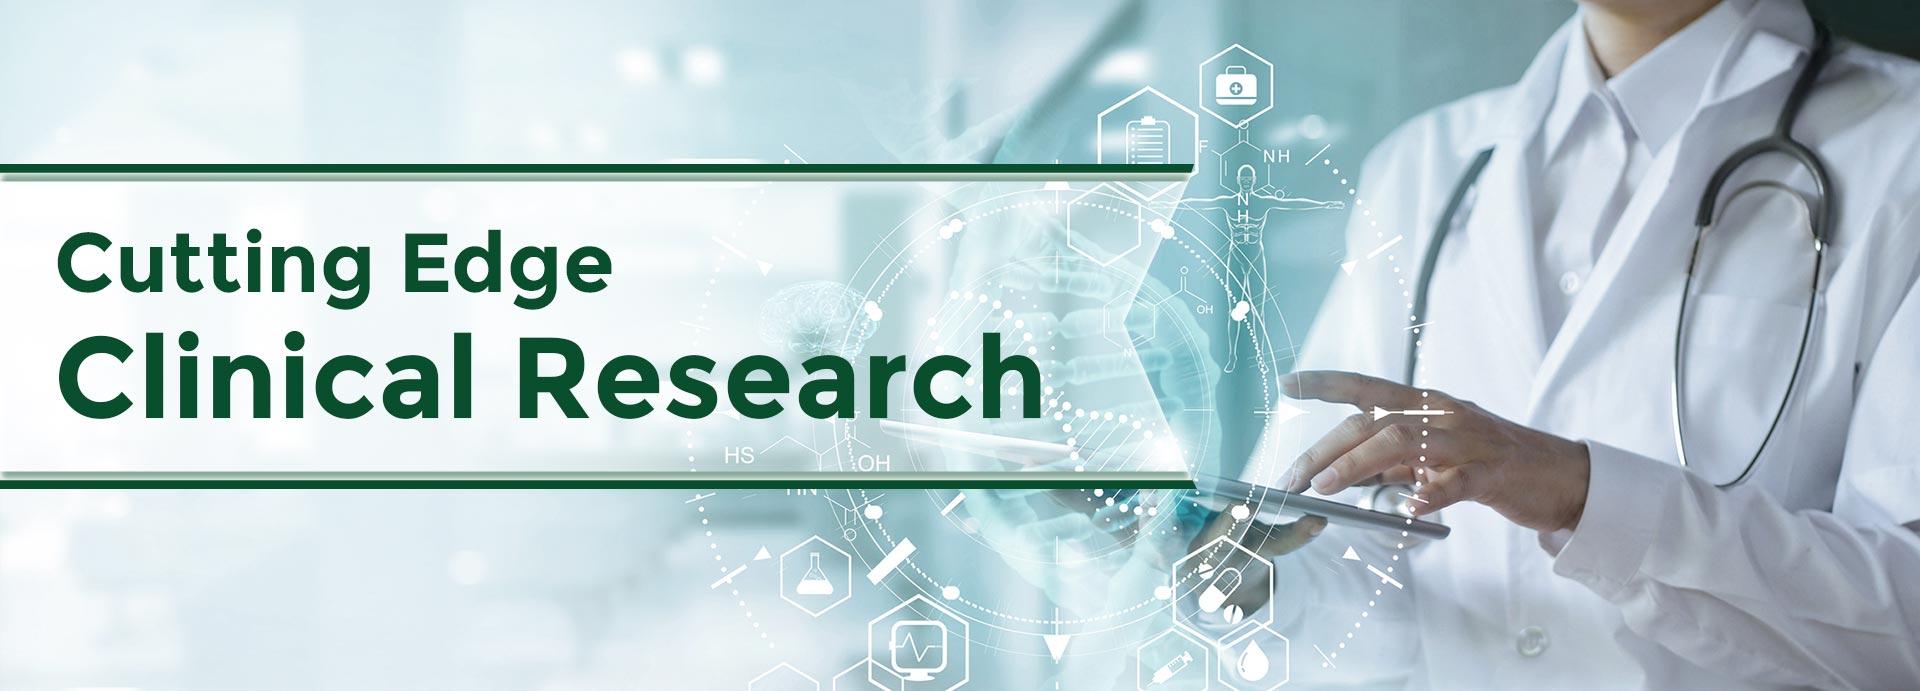 Cutting Edge Clinical Research.